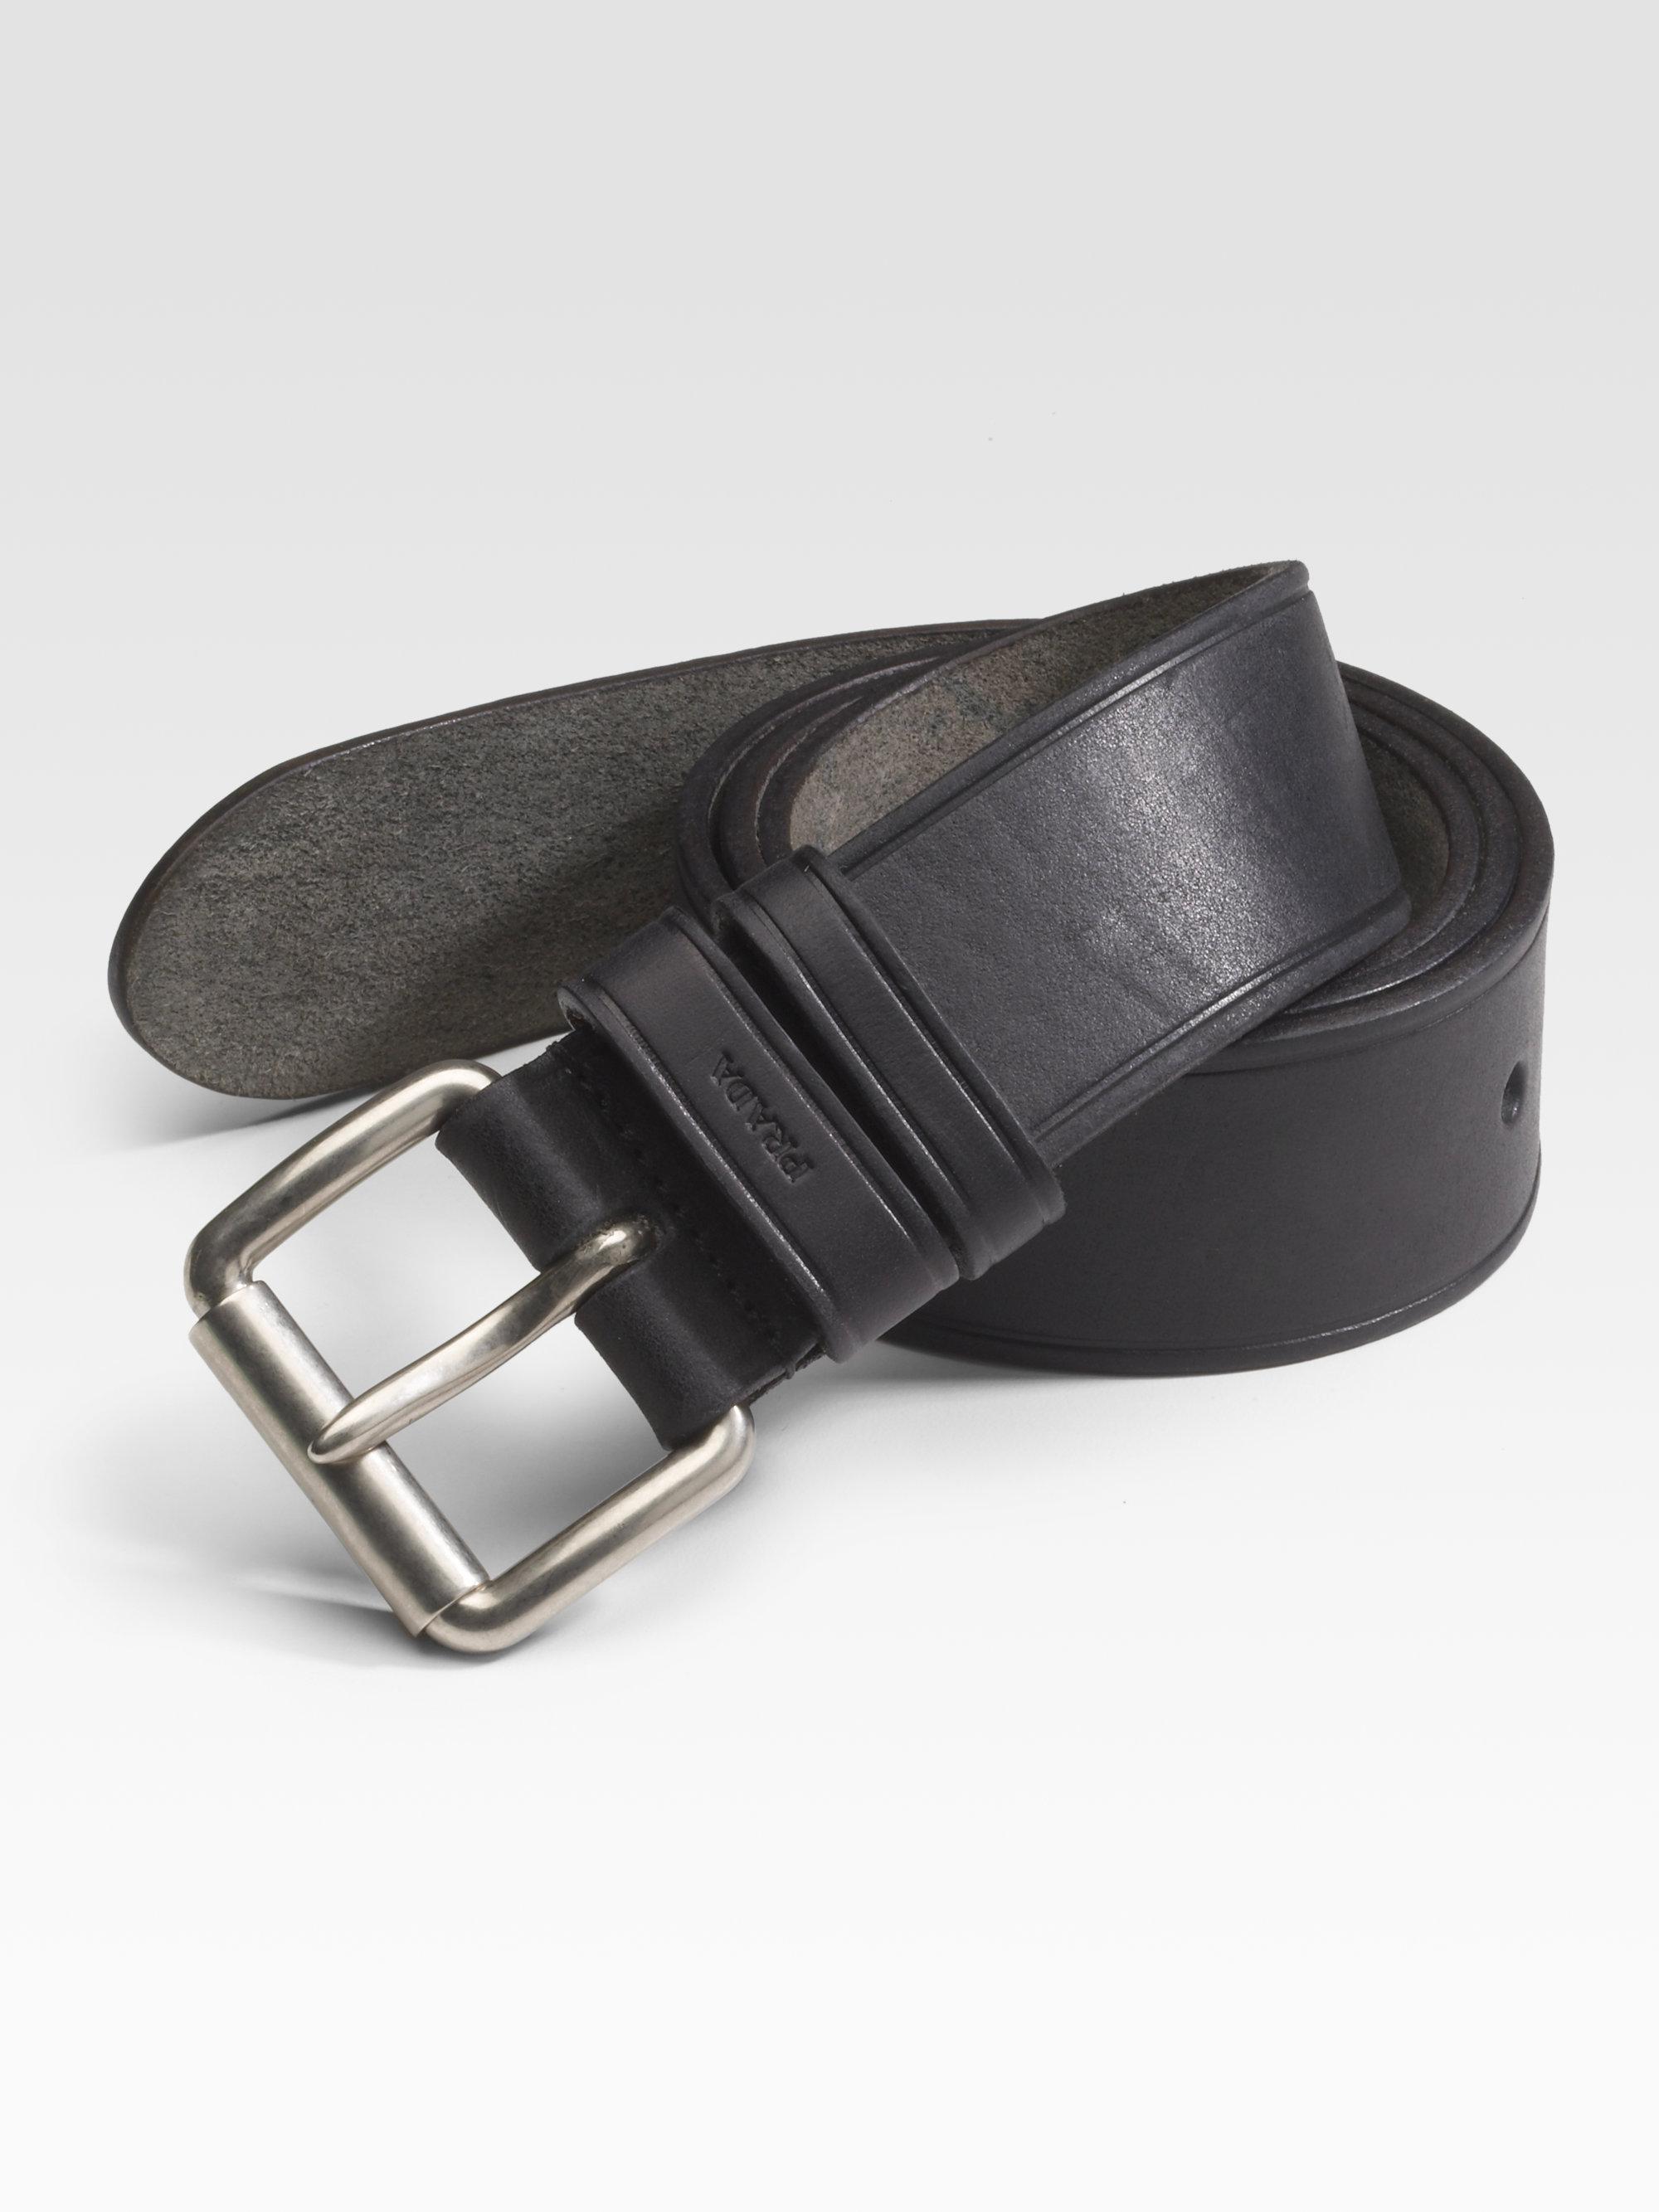 black prada bag with gold hardware - prada men's black belt